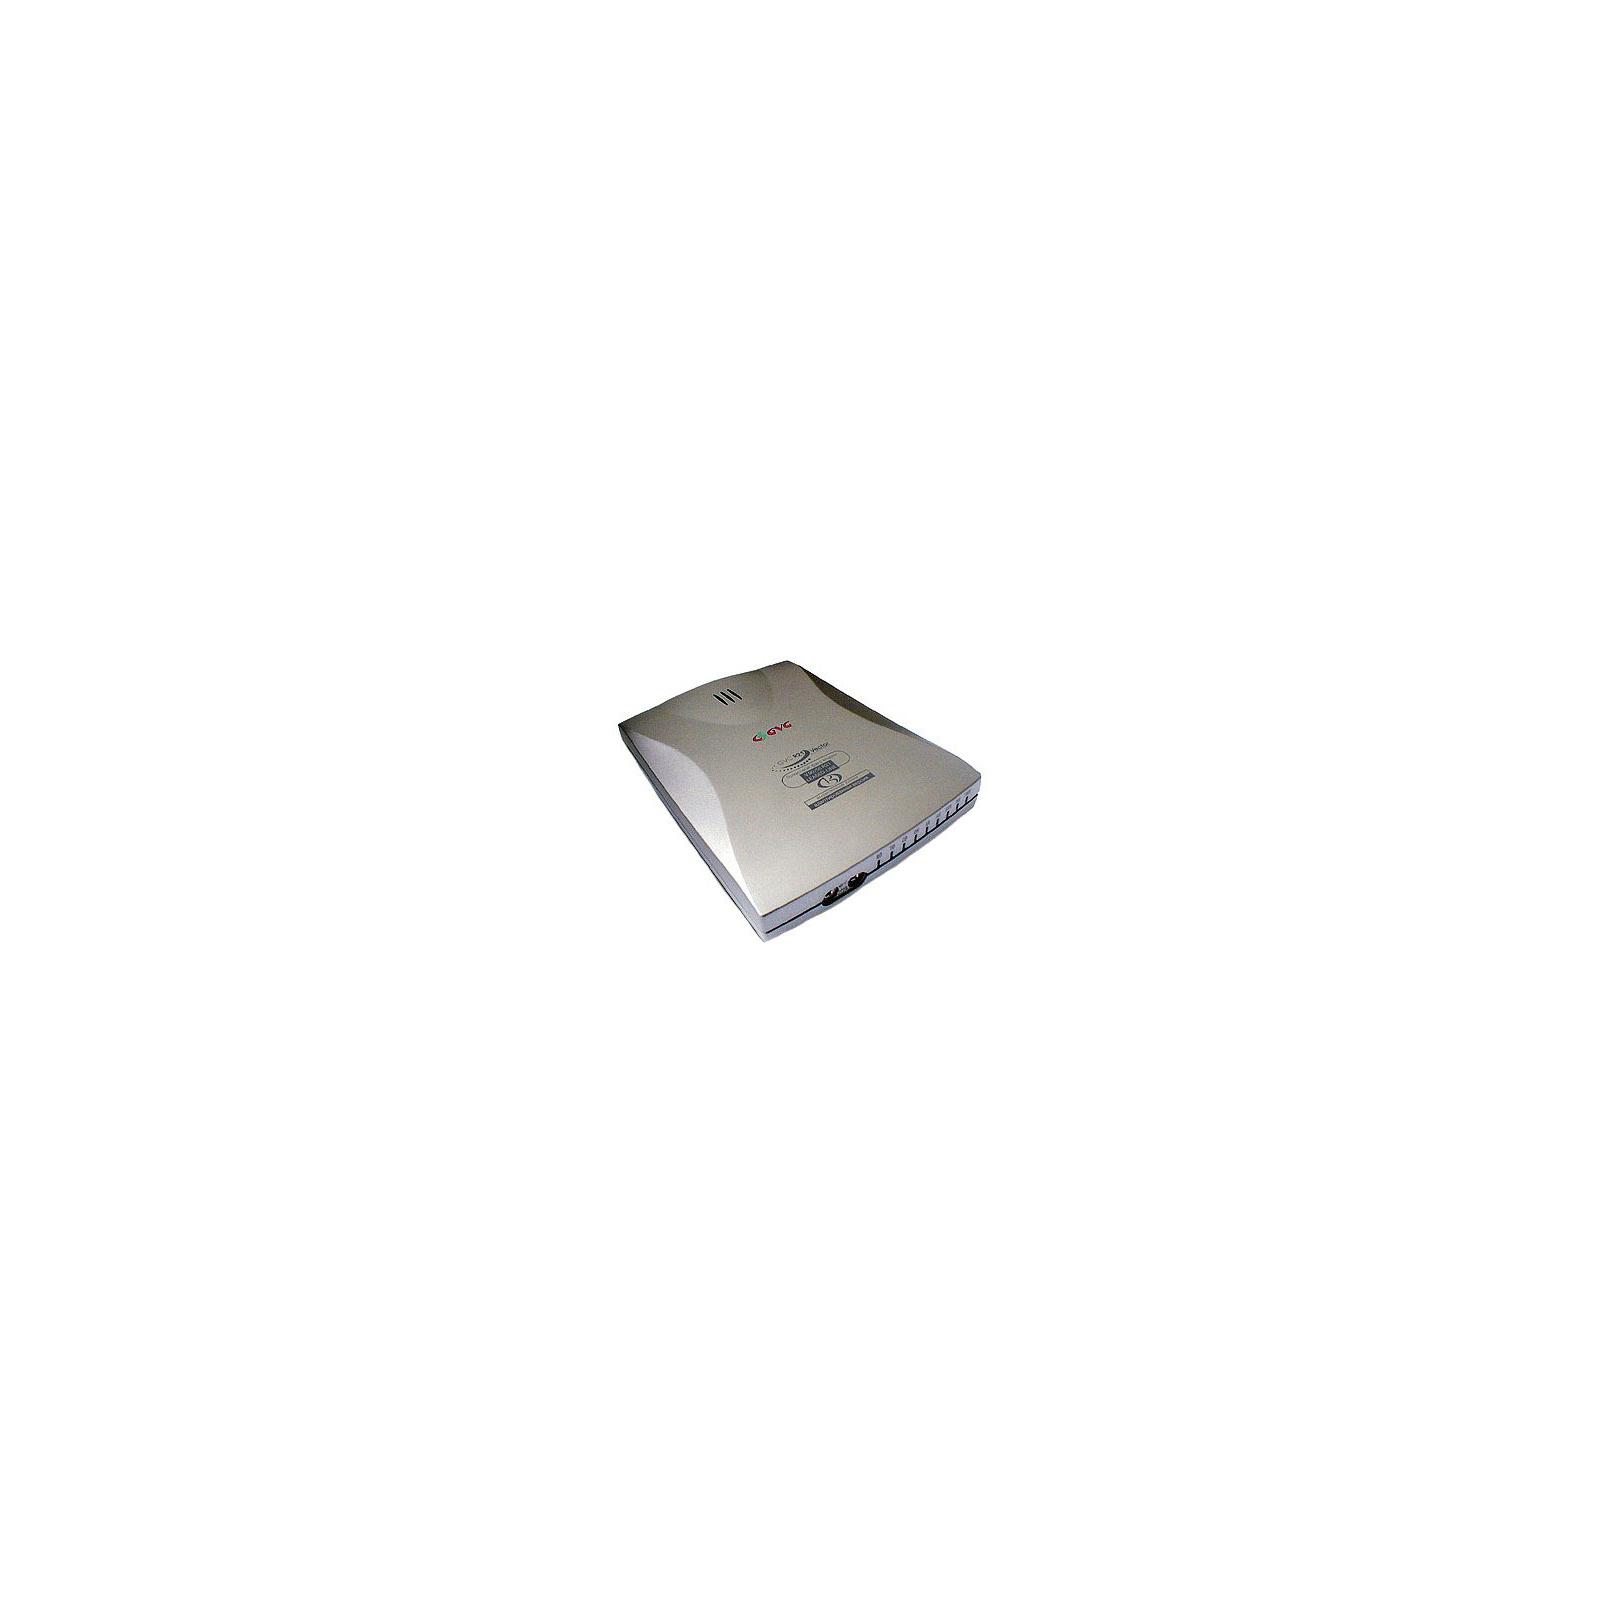 Модем GVC SF-1156V/K4D